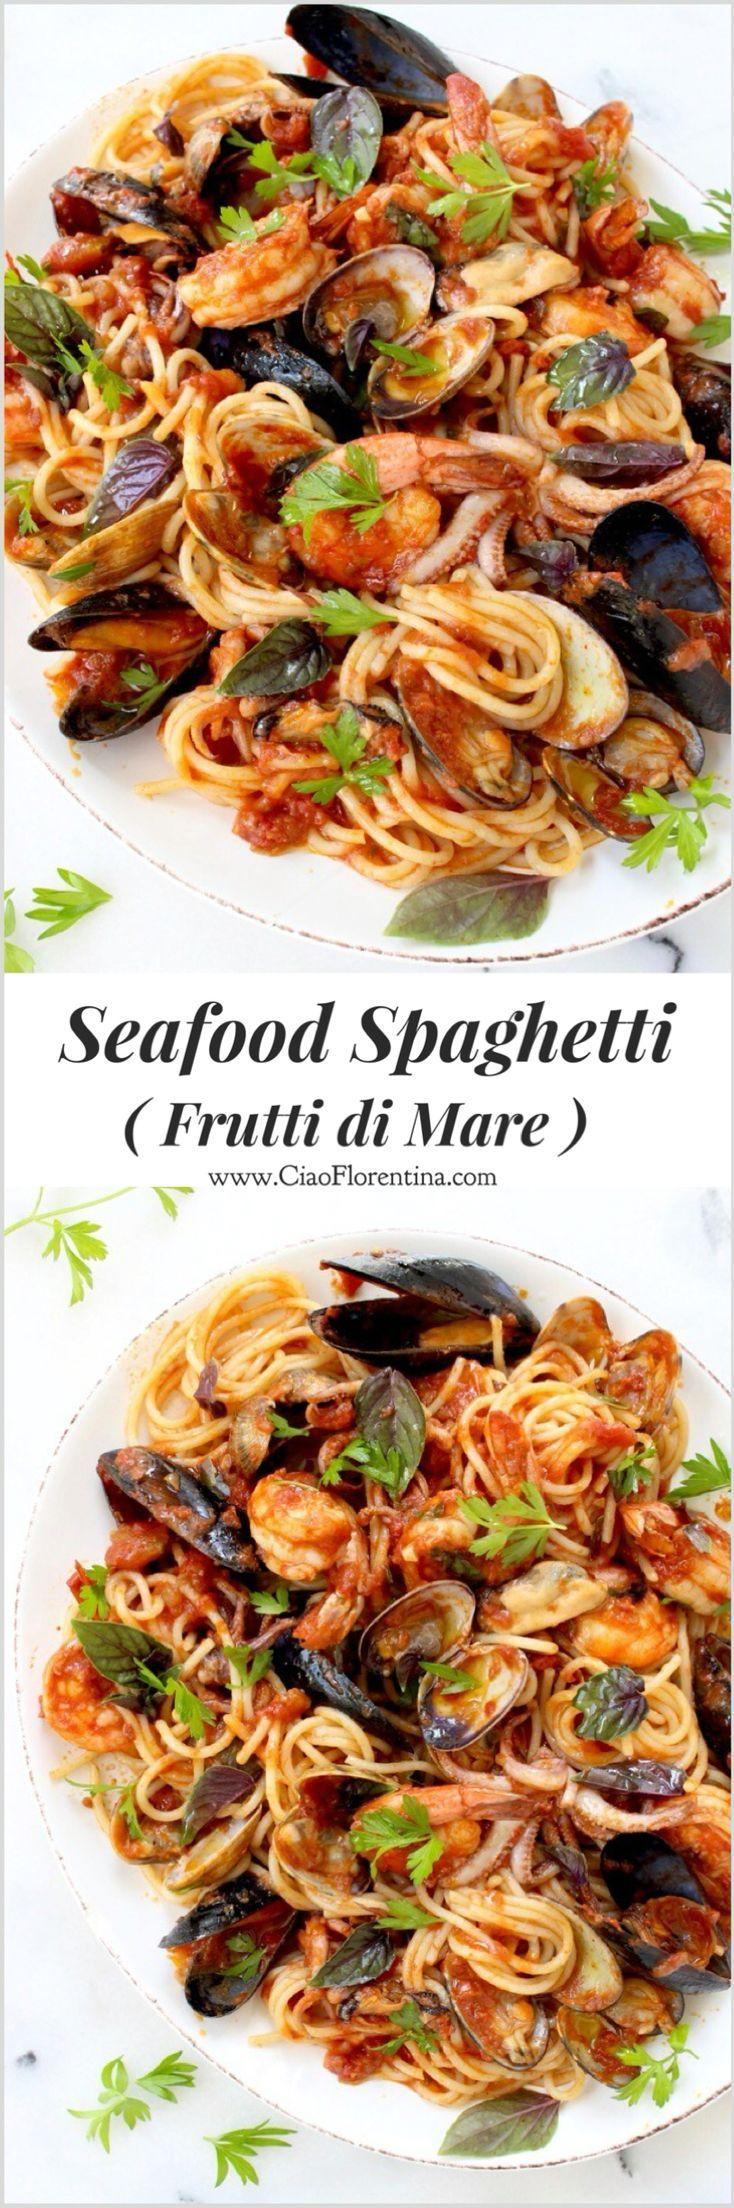 Seafood Spaghetti Recipe or Spaghetti Frutti di Mare | CiaoFlorentina.com @CiaoFlorentina